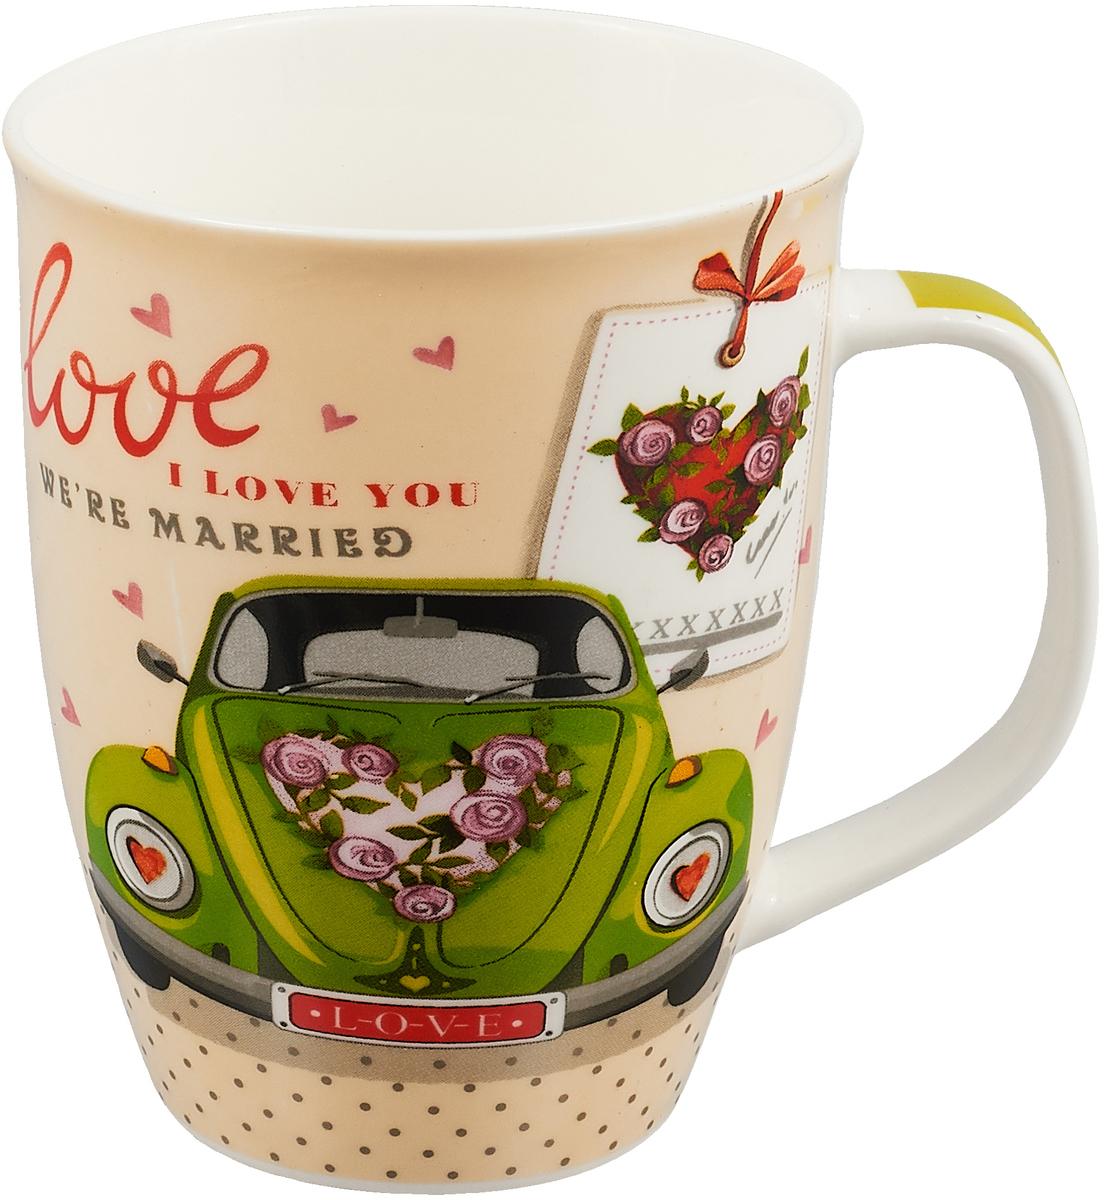 Кружка Loraine Love, цвет: песочный, зеленый, 340 мл. 25973 кружка loraine i love you цвет белый красный розовый 320 мл